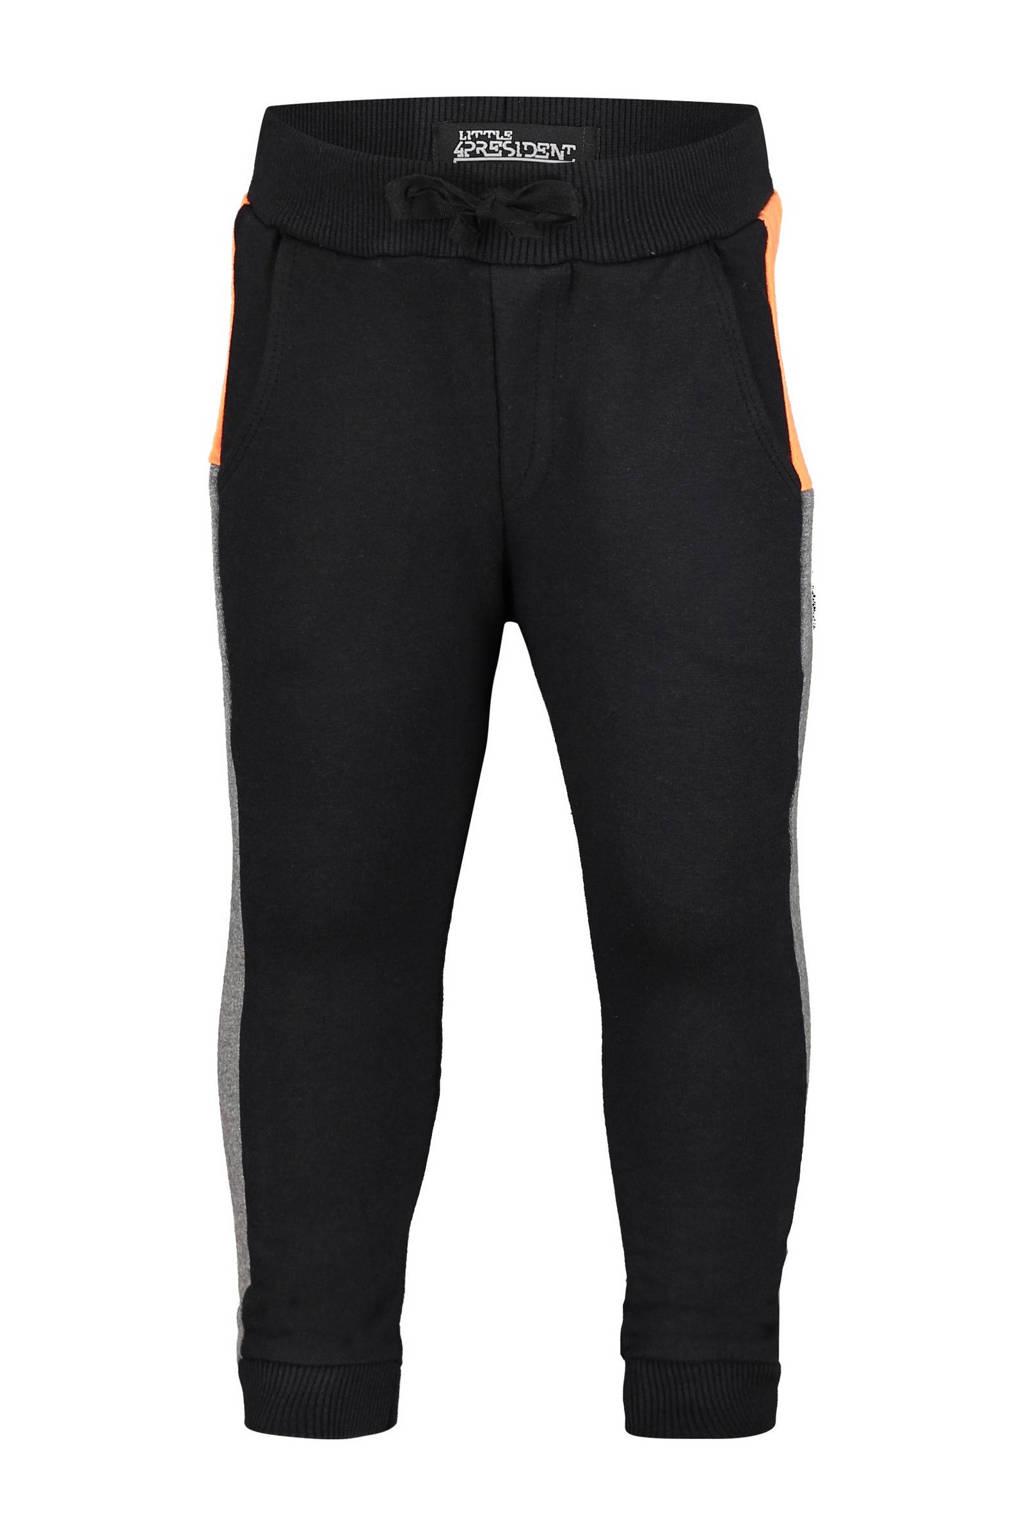 4PRESIDENT tapered fit broek Cabe met zijstreep zwart/oranje/antraciet, Zwart/oranje/antraciet